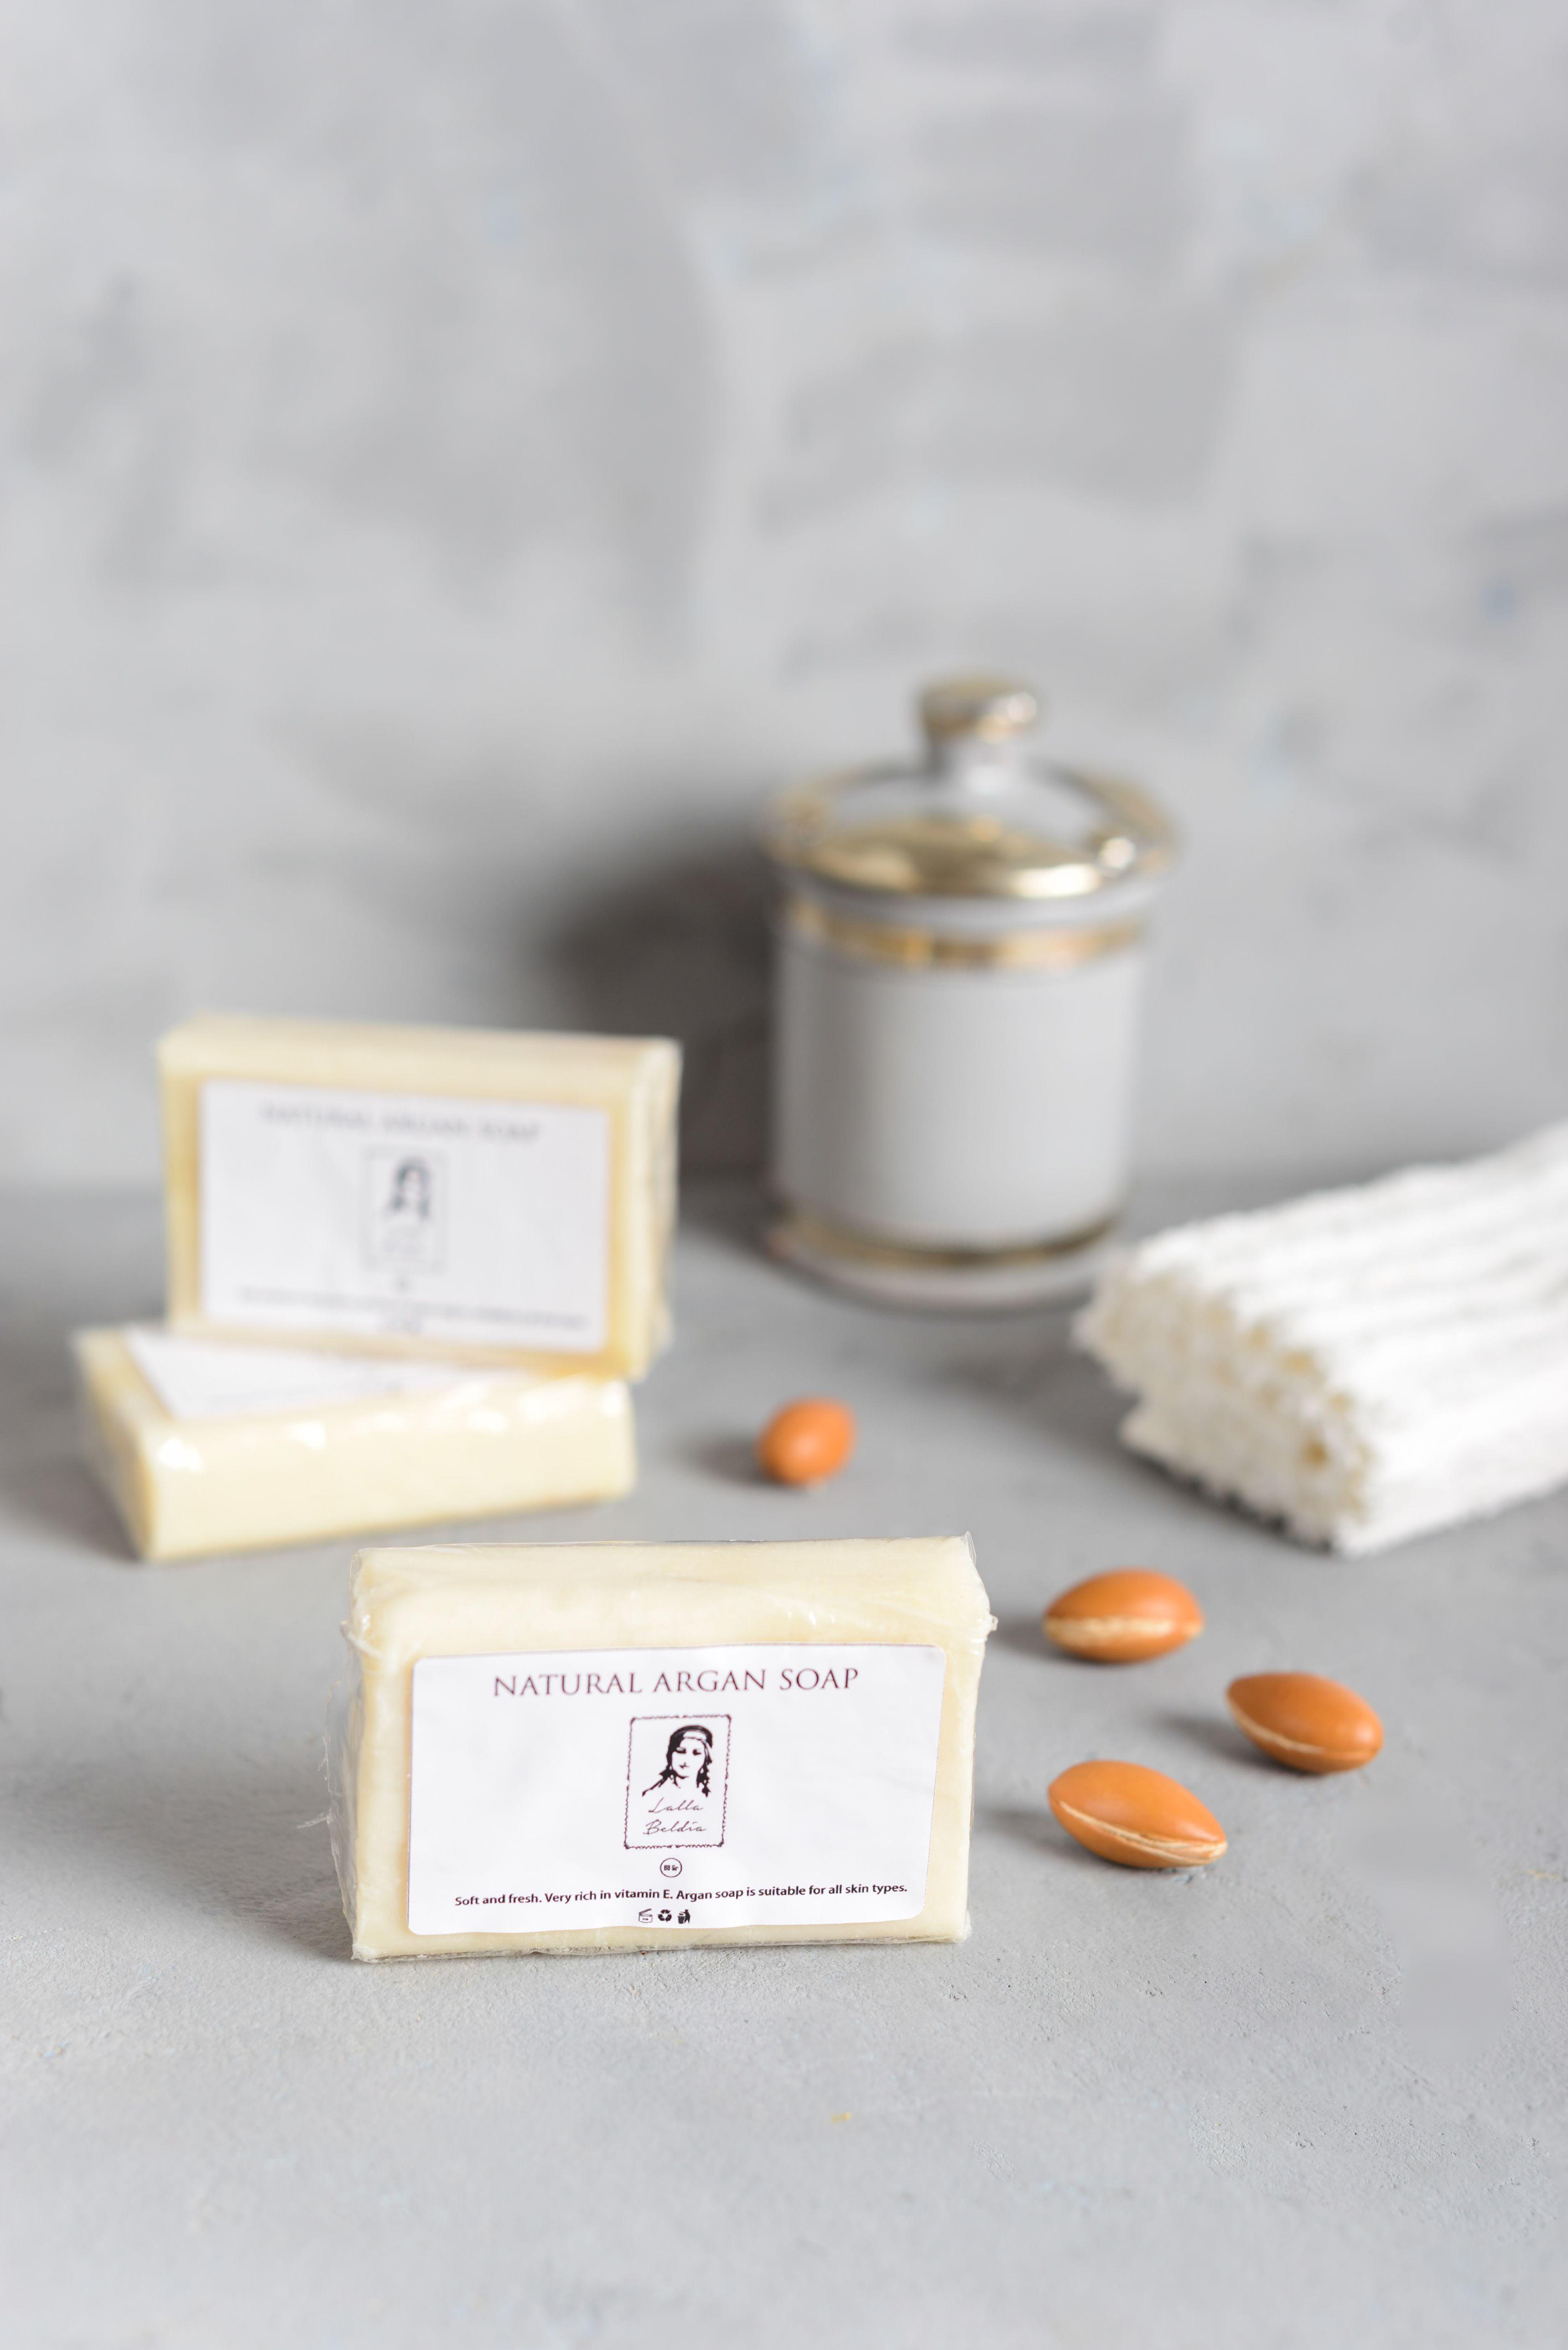 Natural Argan Soap